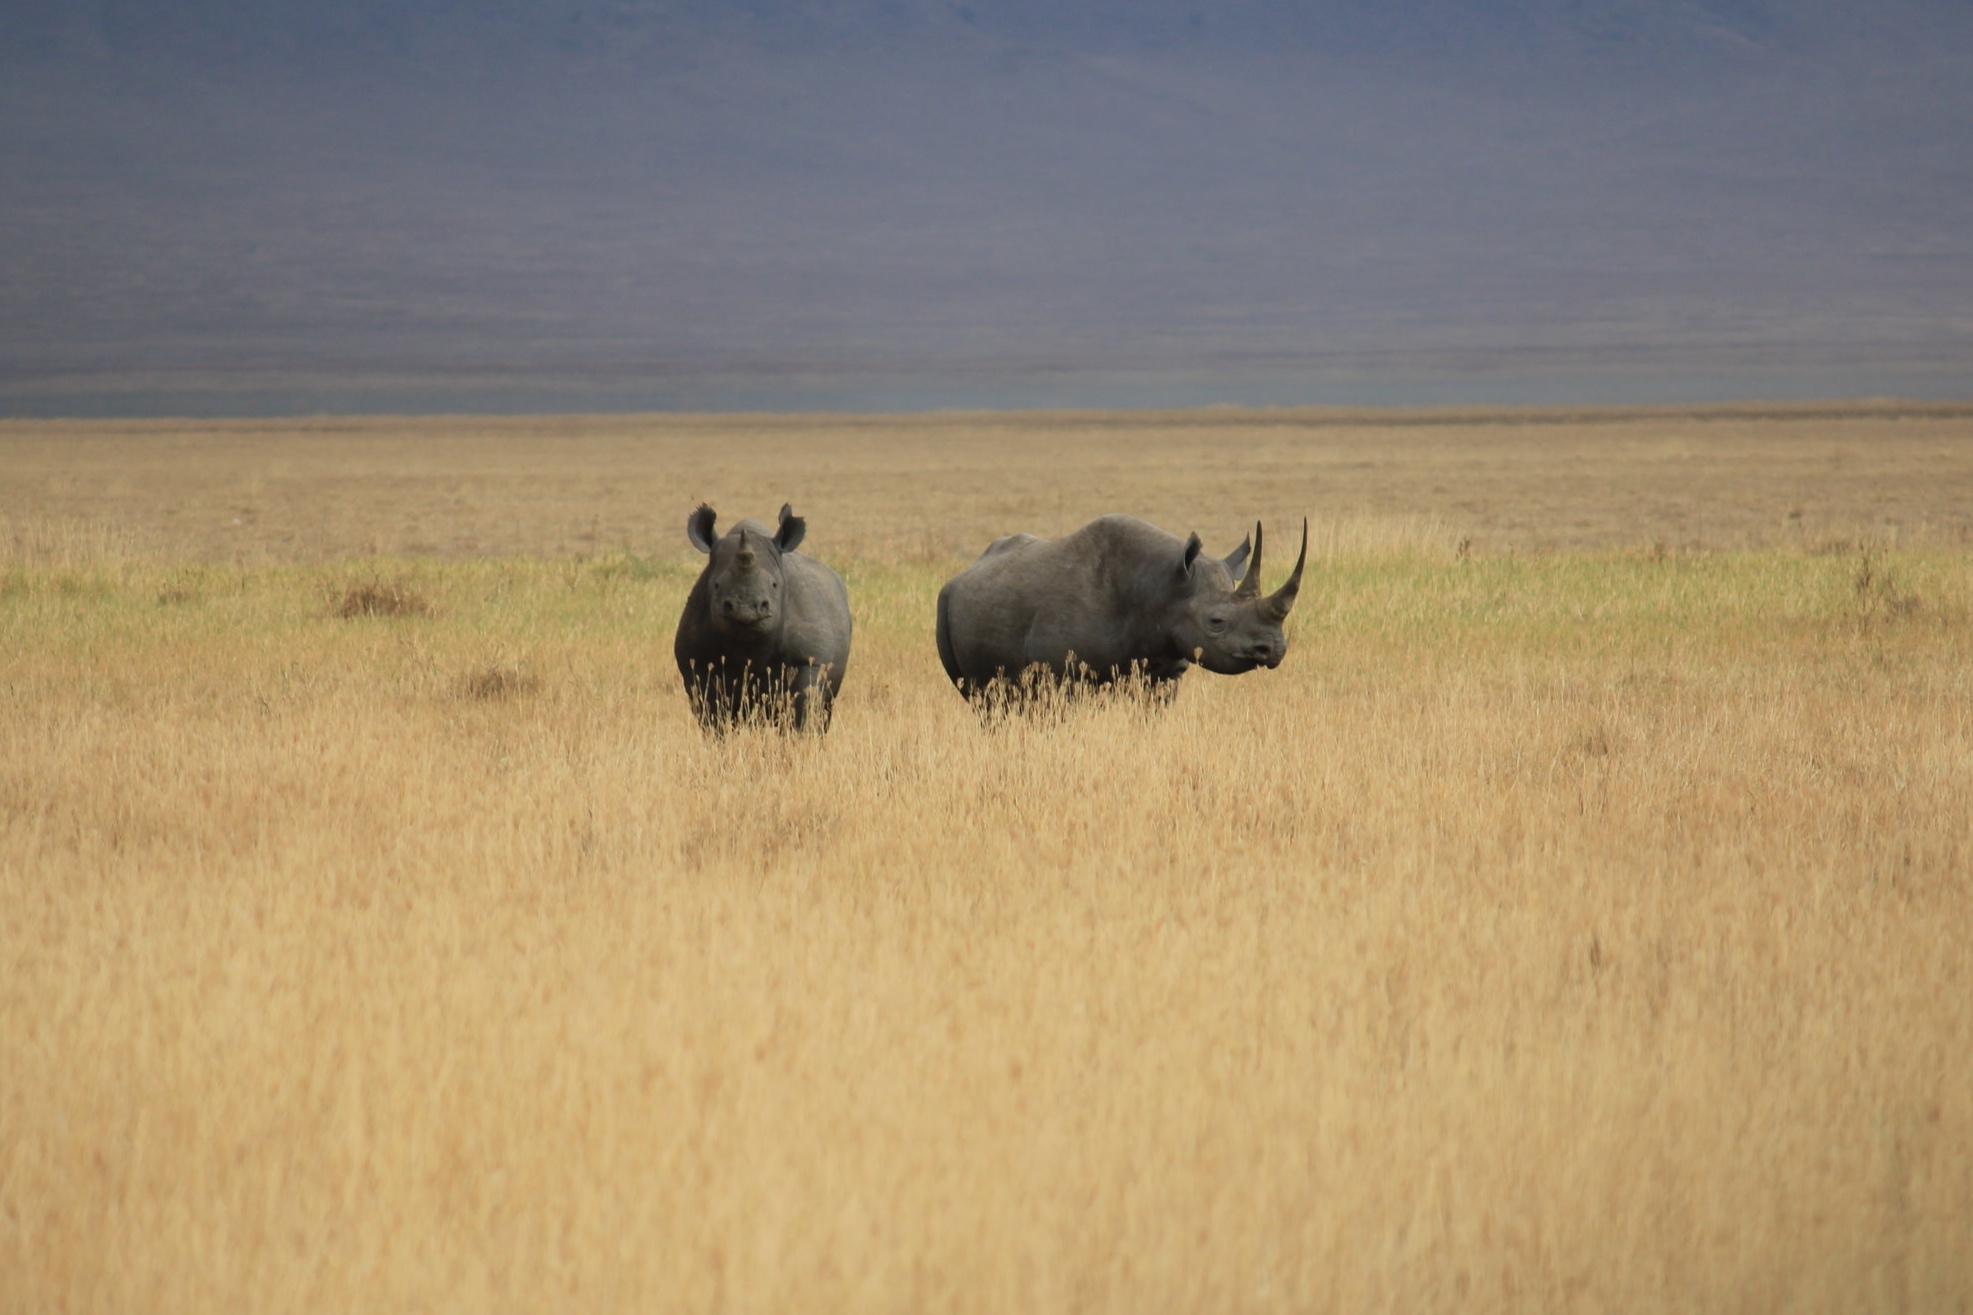 A pair of critically endangered black rhinoceros, Kenya. Photo credit: Peter Mugno.